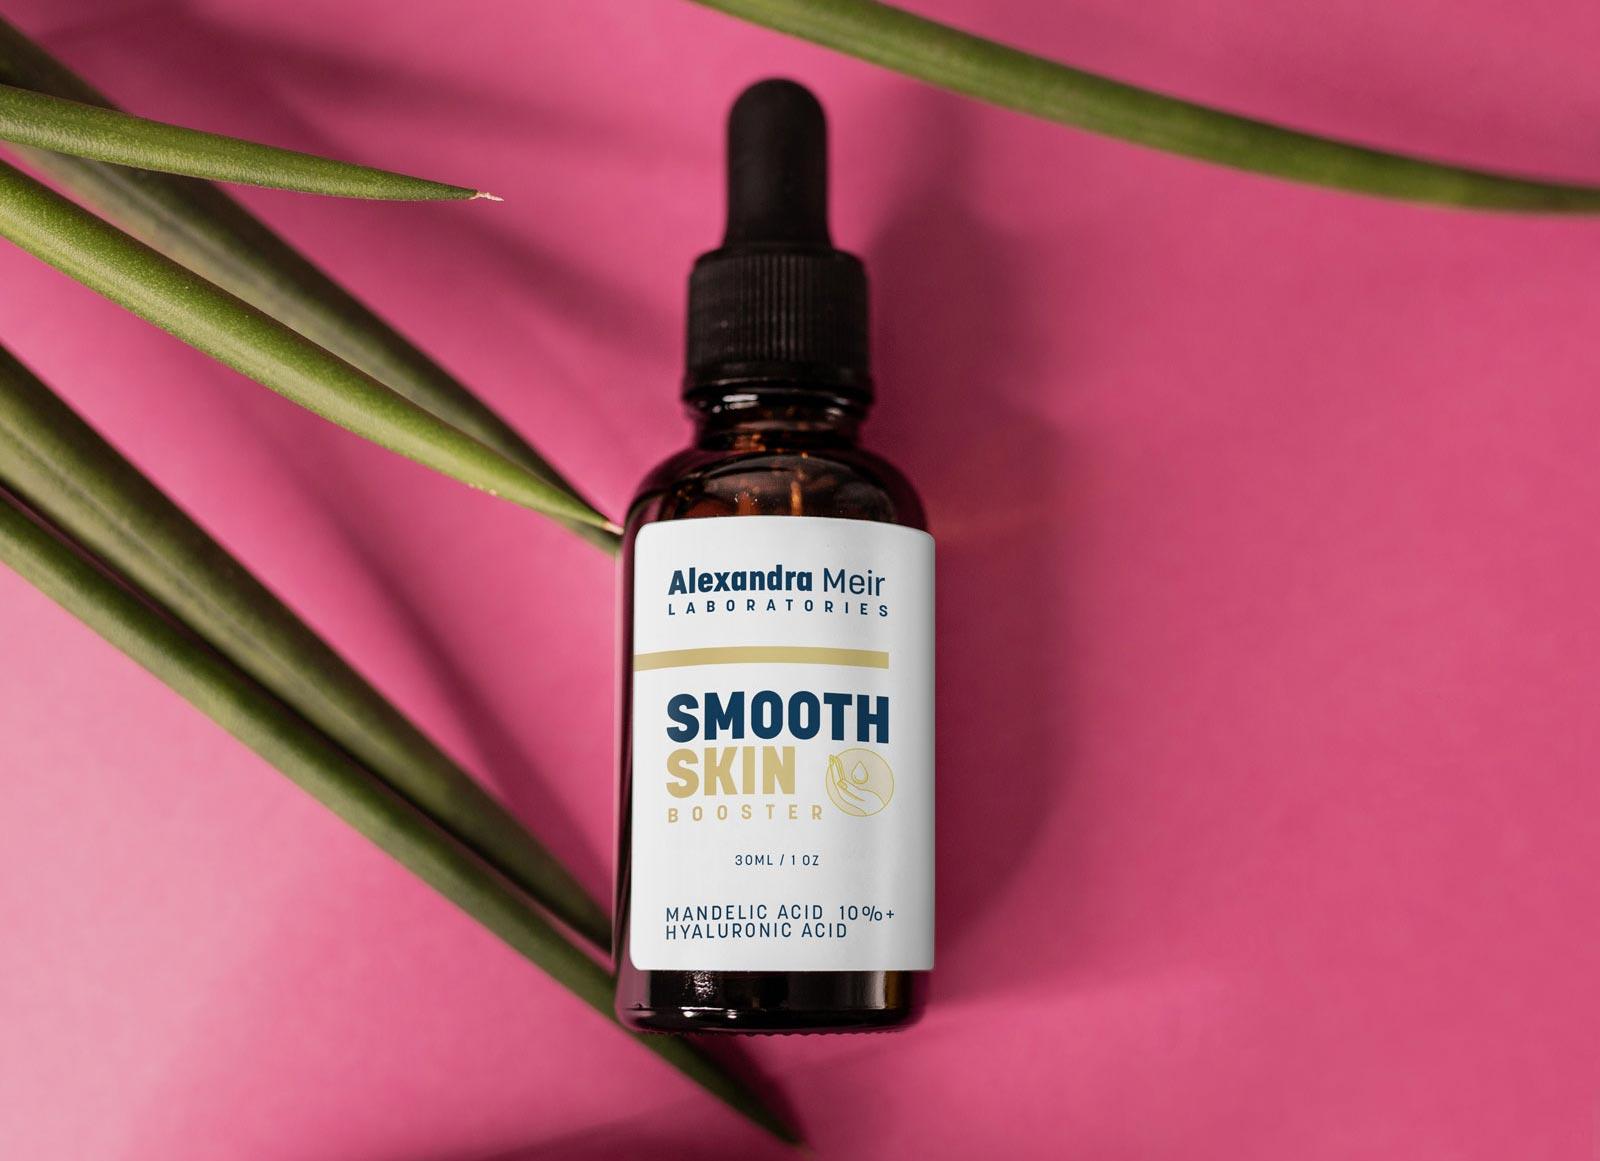 Free-Smooth-Skin-Dropper-Bottle-Mockup-PSD